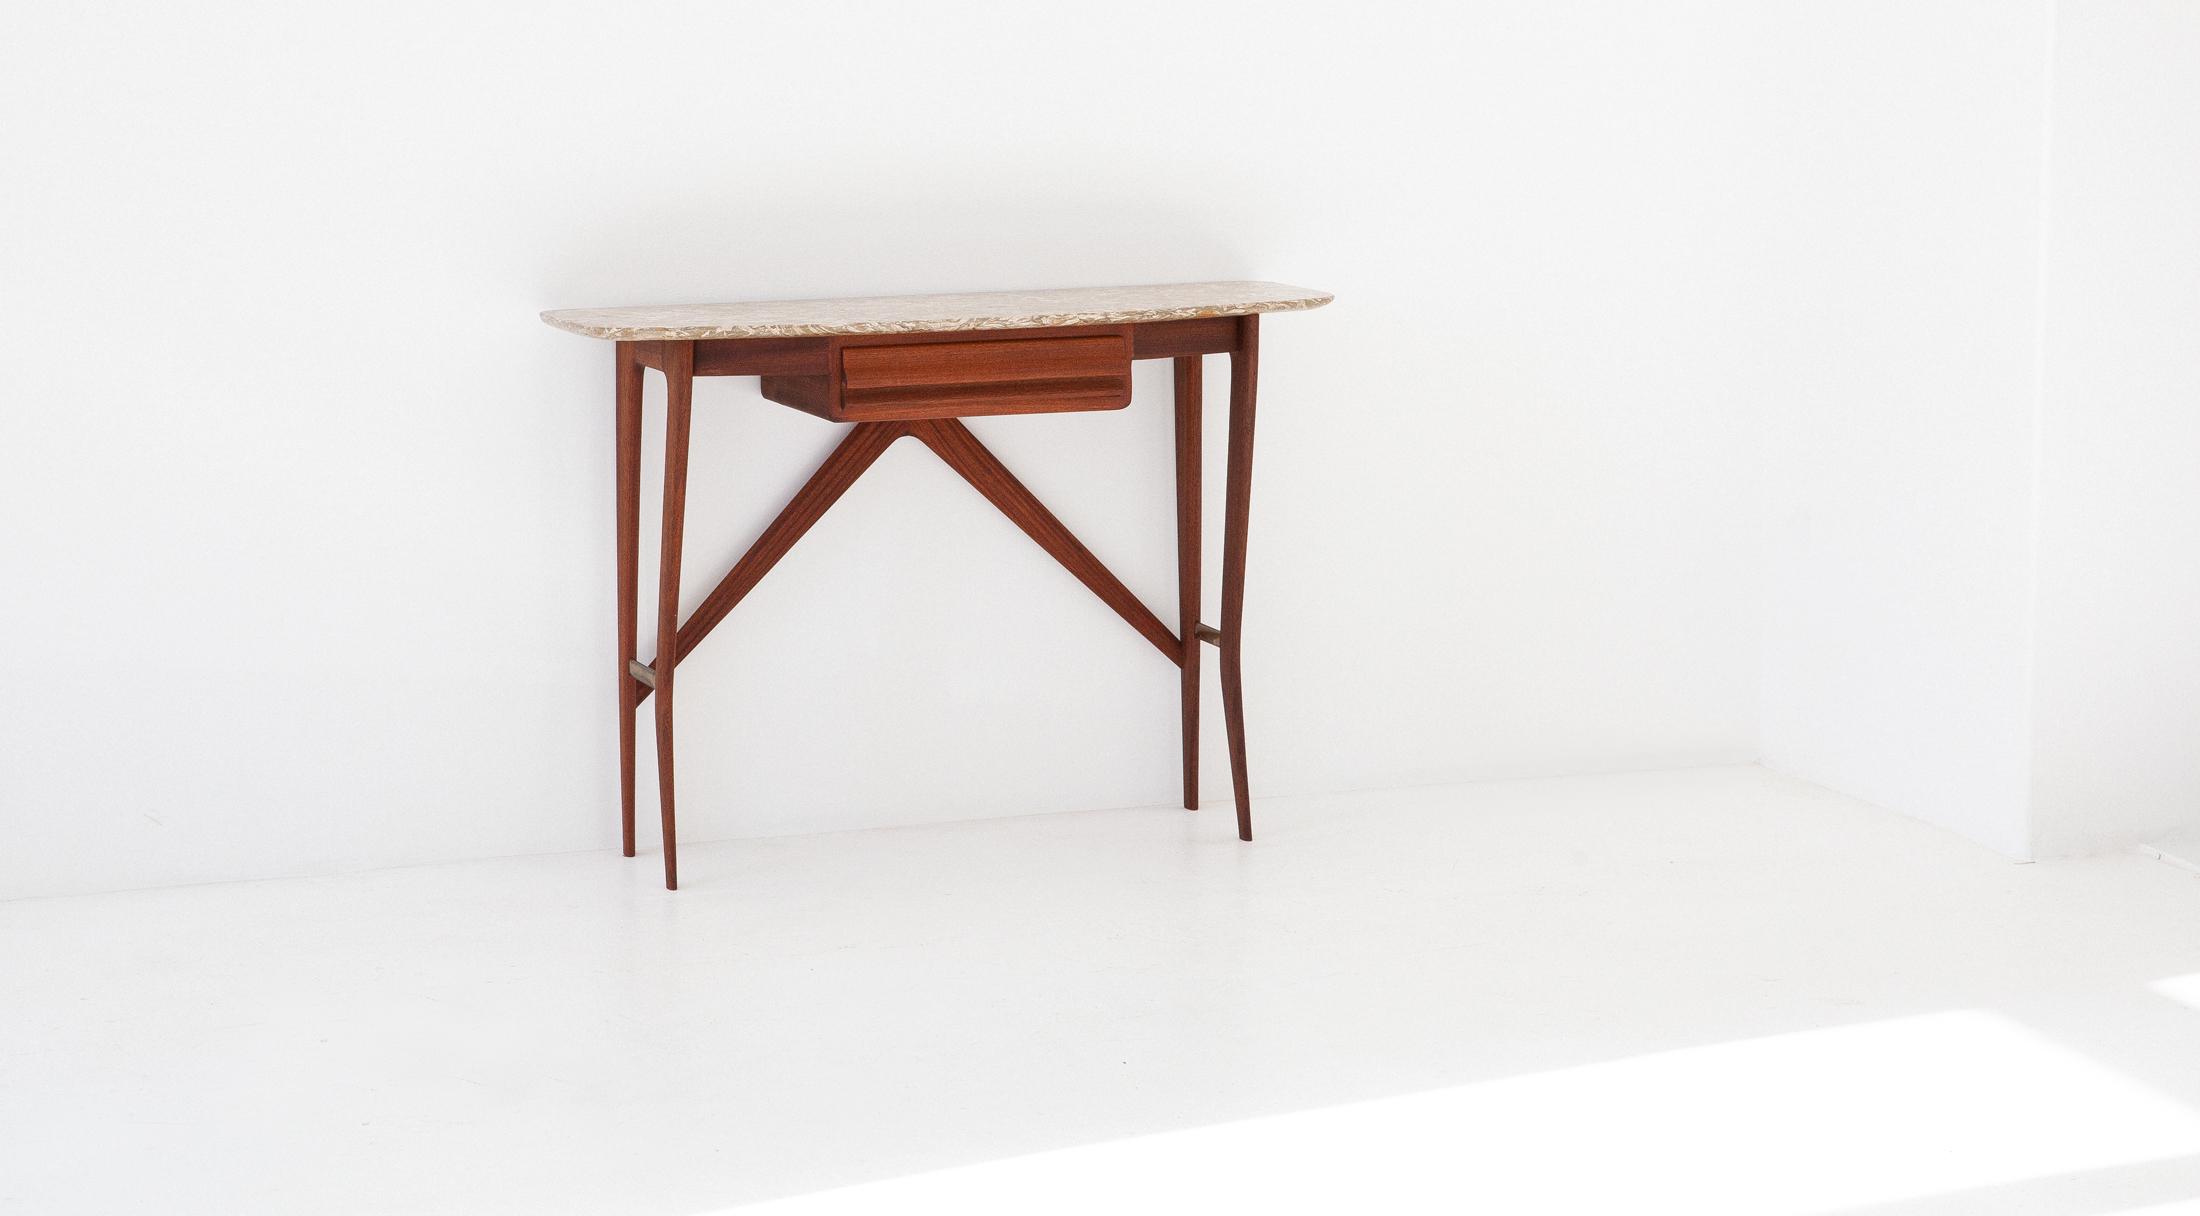 OF82-mahogany-marble-console-table-la-permanente-cantu-8 - Copia